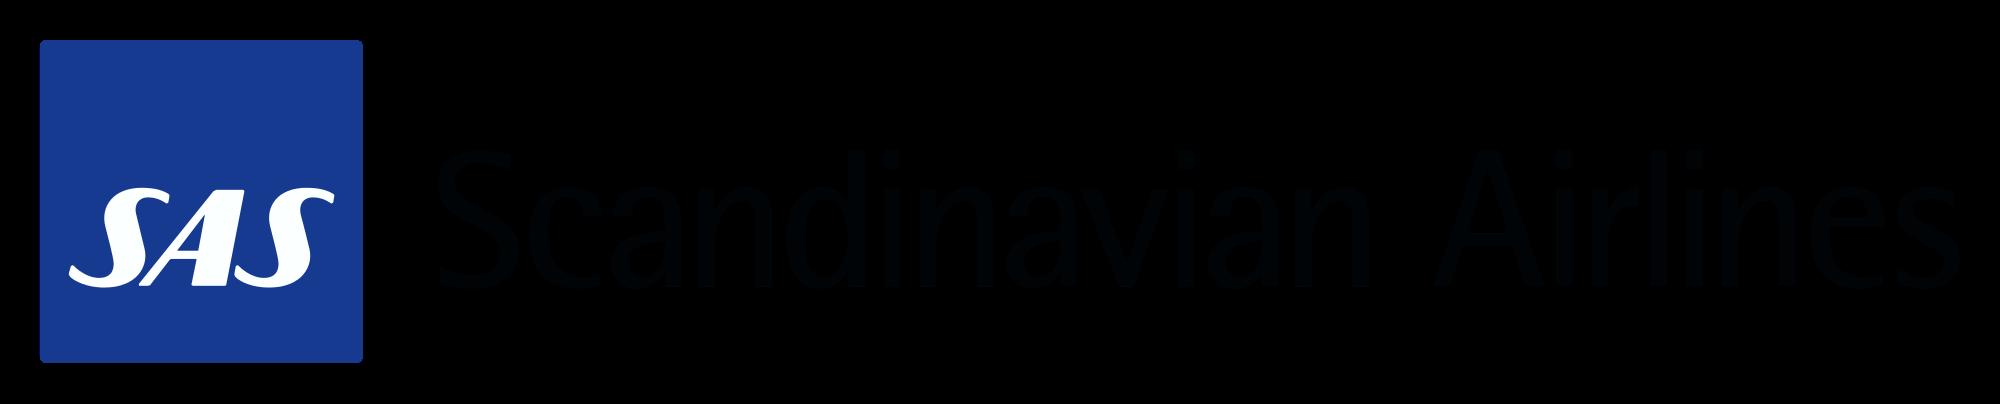 SAS-Scandinavian-Airlines-Logo.svg